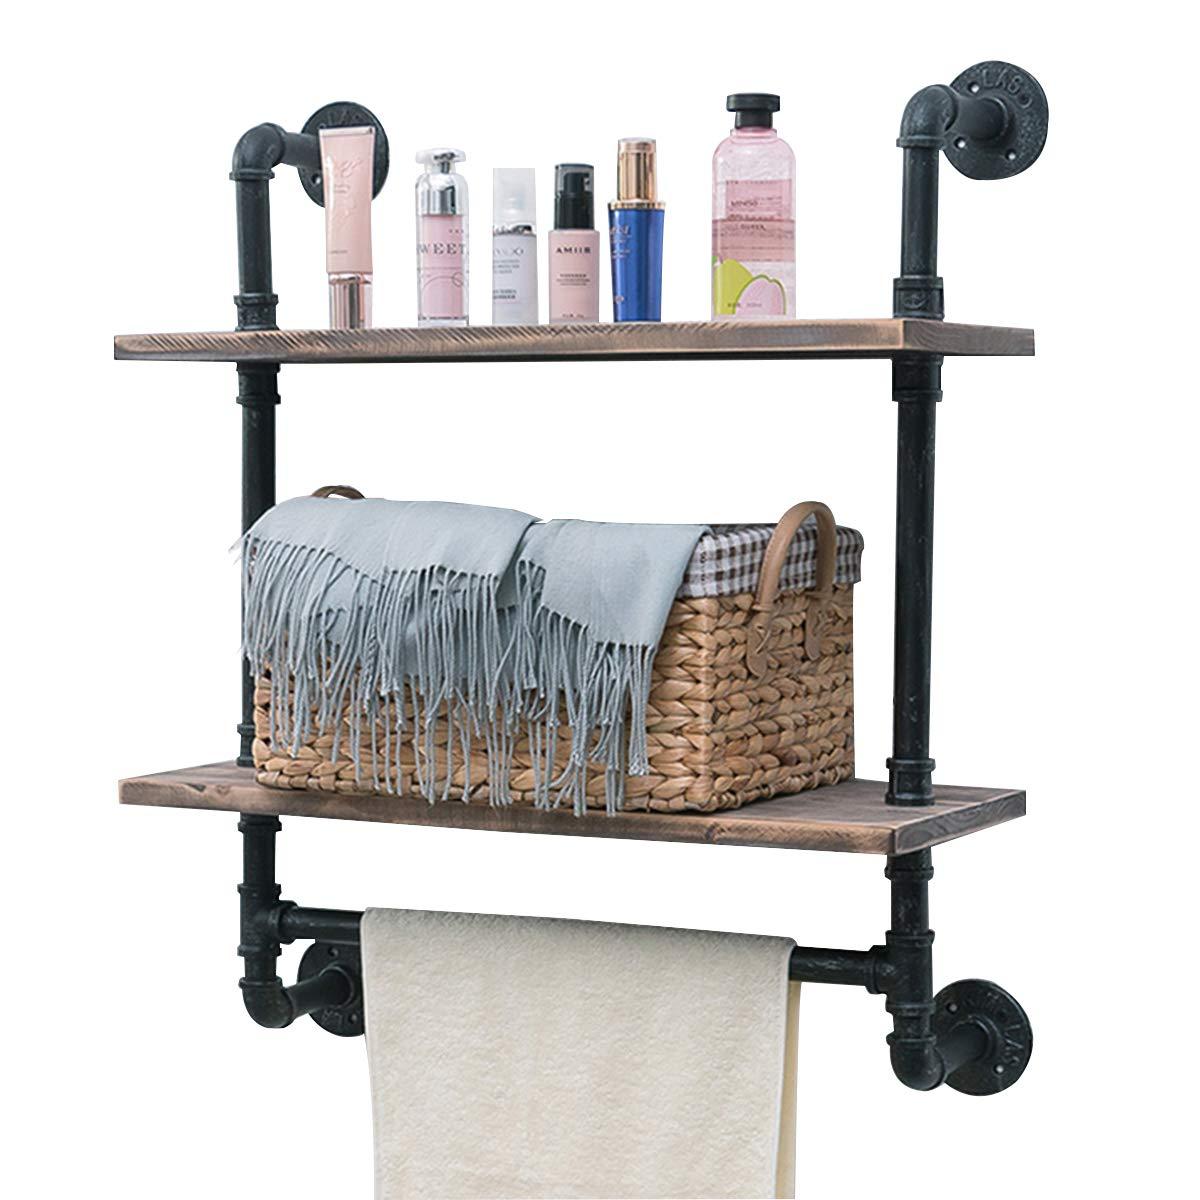 Industrial Pipe Shelf,Rustic Wall Shelf with Towel Bar,24'' Towel Racks for Bathroom,2 Tiered Pipe Shelves Wood Shelf Shelving by MBQQ